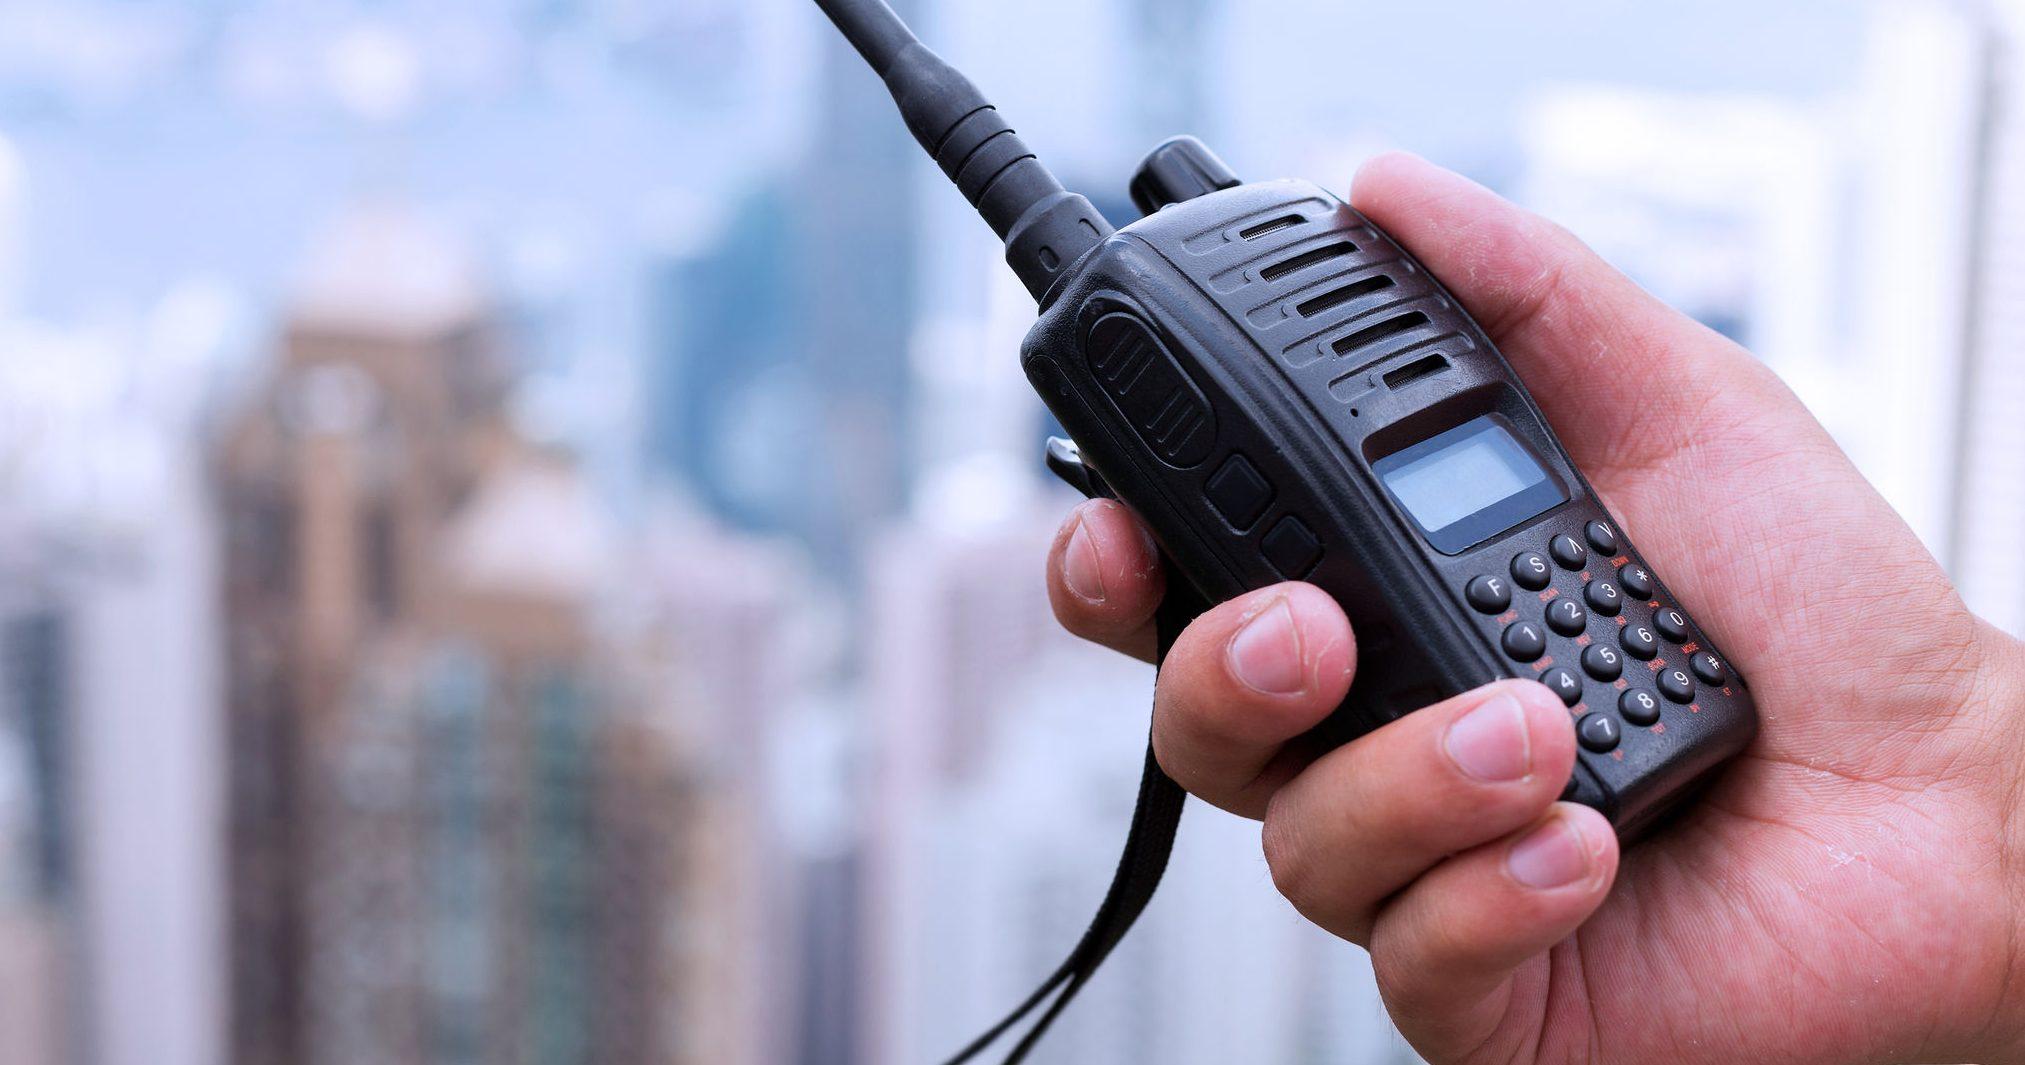 segurando um walkie-talkie nas mãos